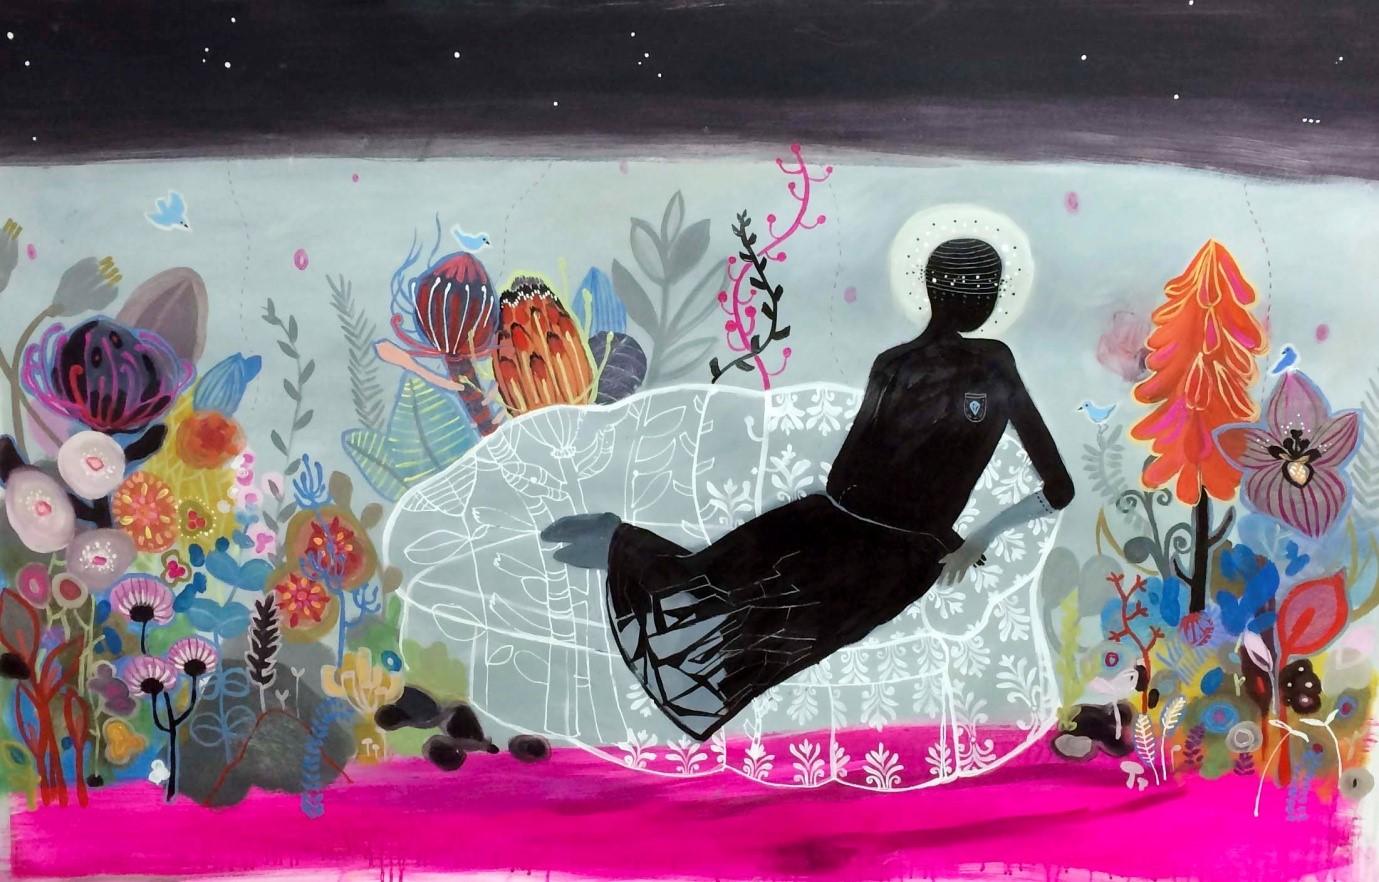 Artwork by Leila Fanner